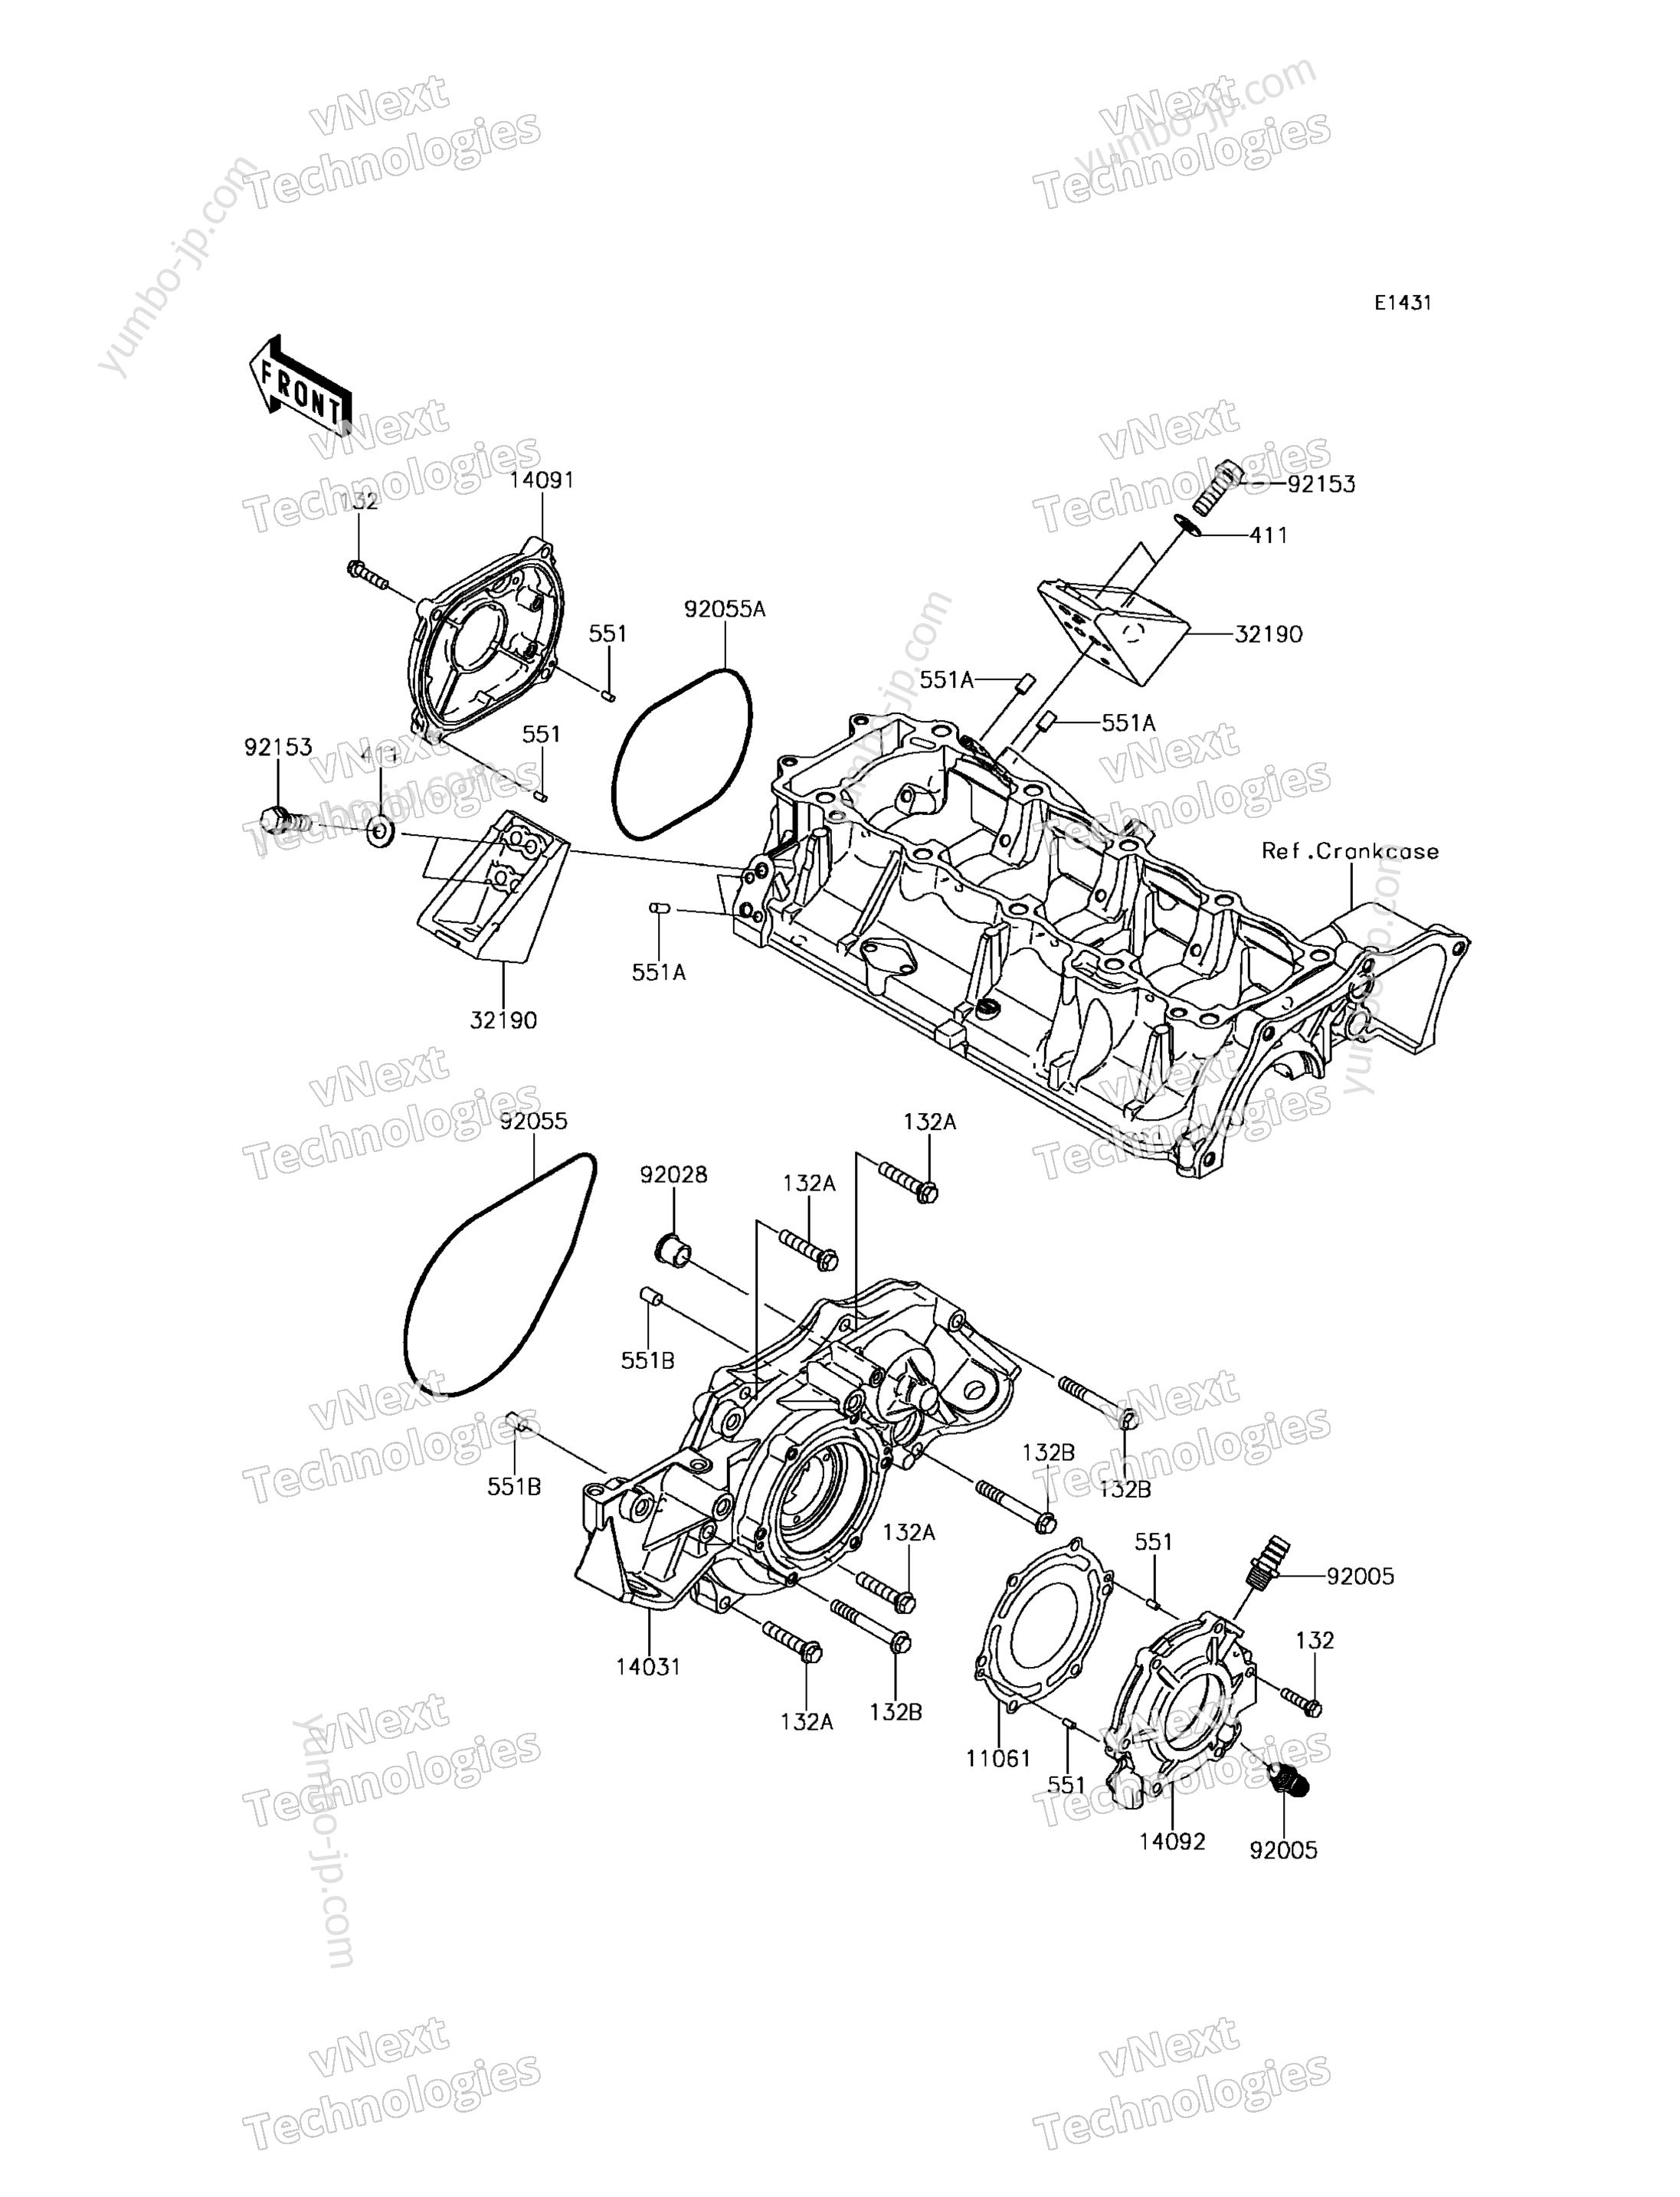 Engine Cover(s) для гидроциклов KAWASAKI JET SKI ULTRA 310X (JT1500PGF) 2016 г.